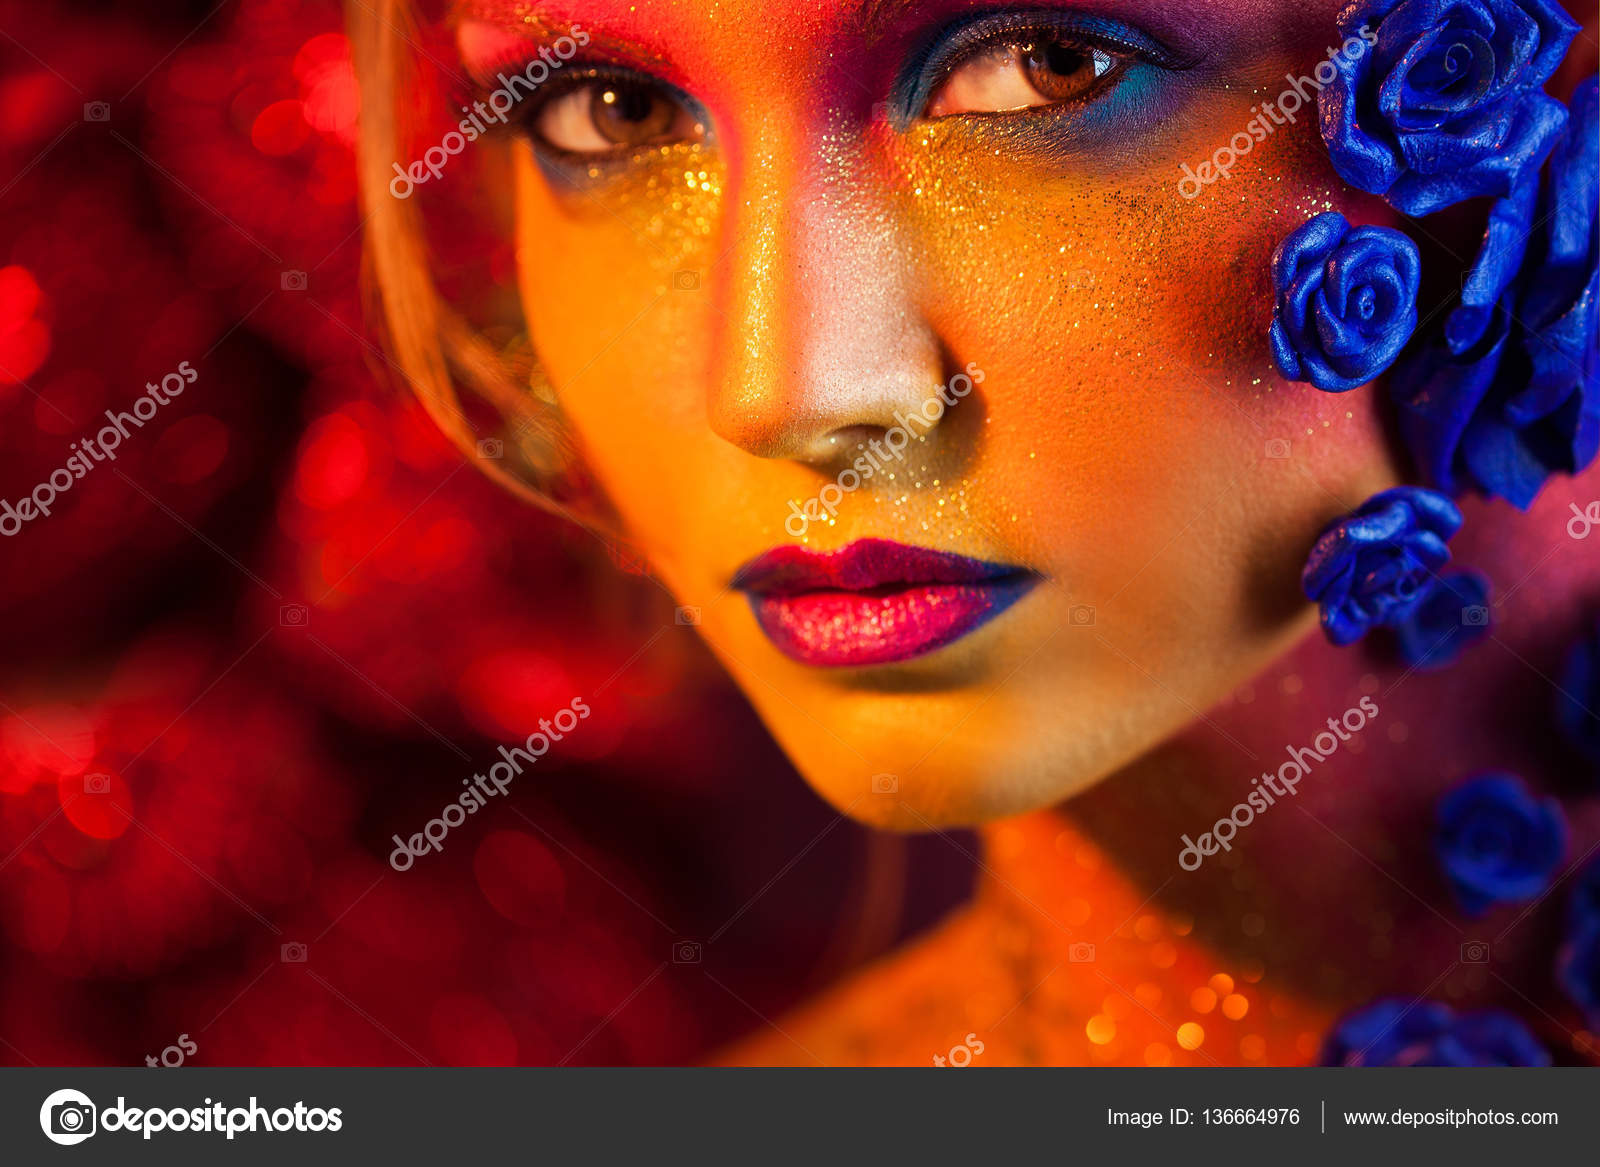 bc09b2903e54 Πορτραίτο του νεαρή και ελκυστική γυναίκα με μακιγιάζ τέχνης. Φλογερά  χρώματα